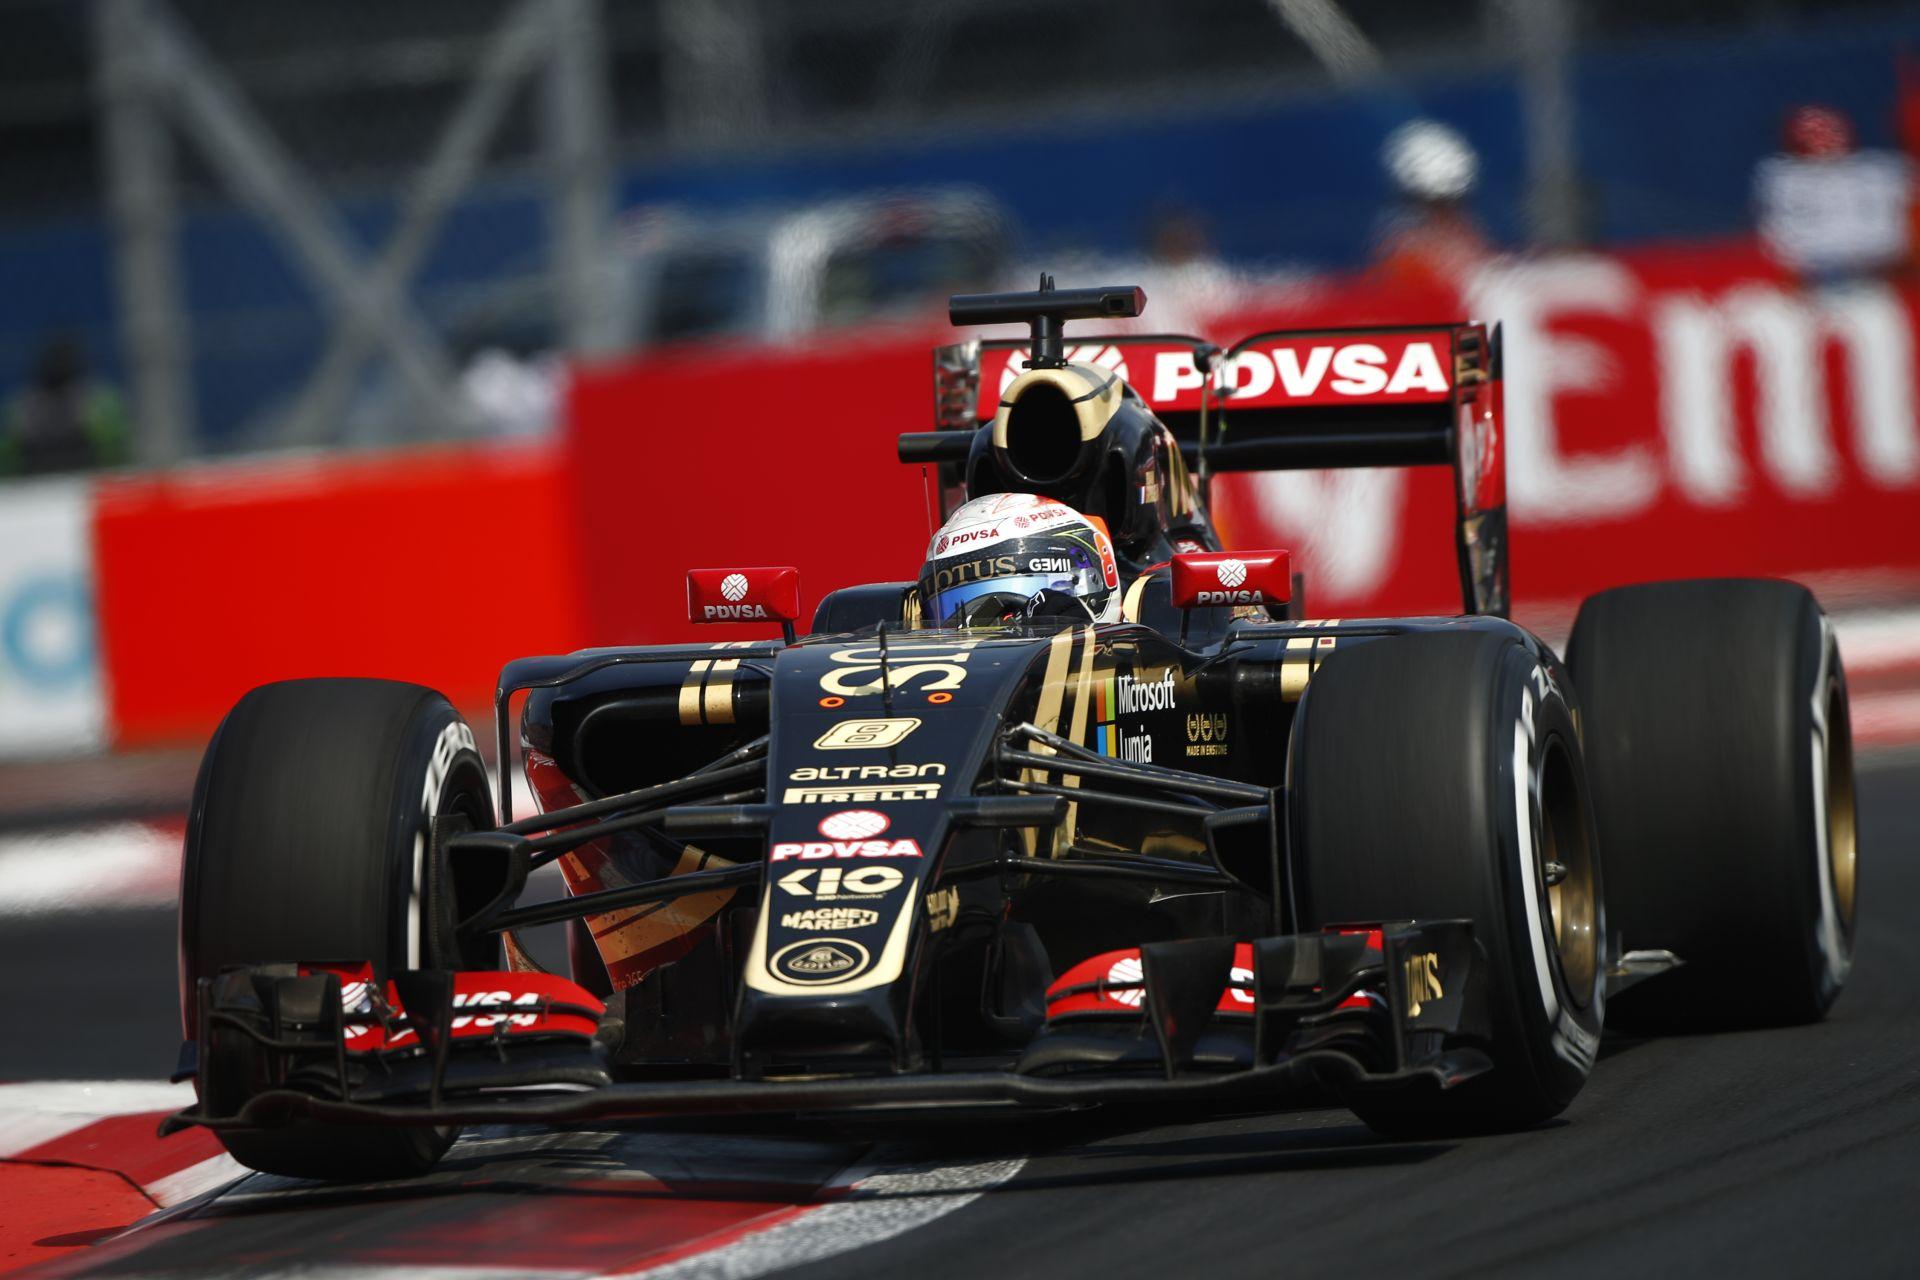 A Renault Abu Dhabiban jelenti be a Lotus átvételét?